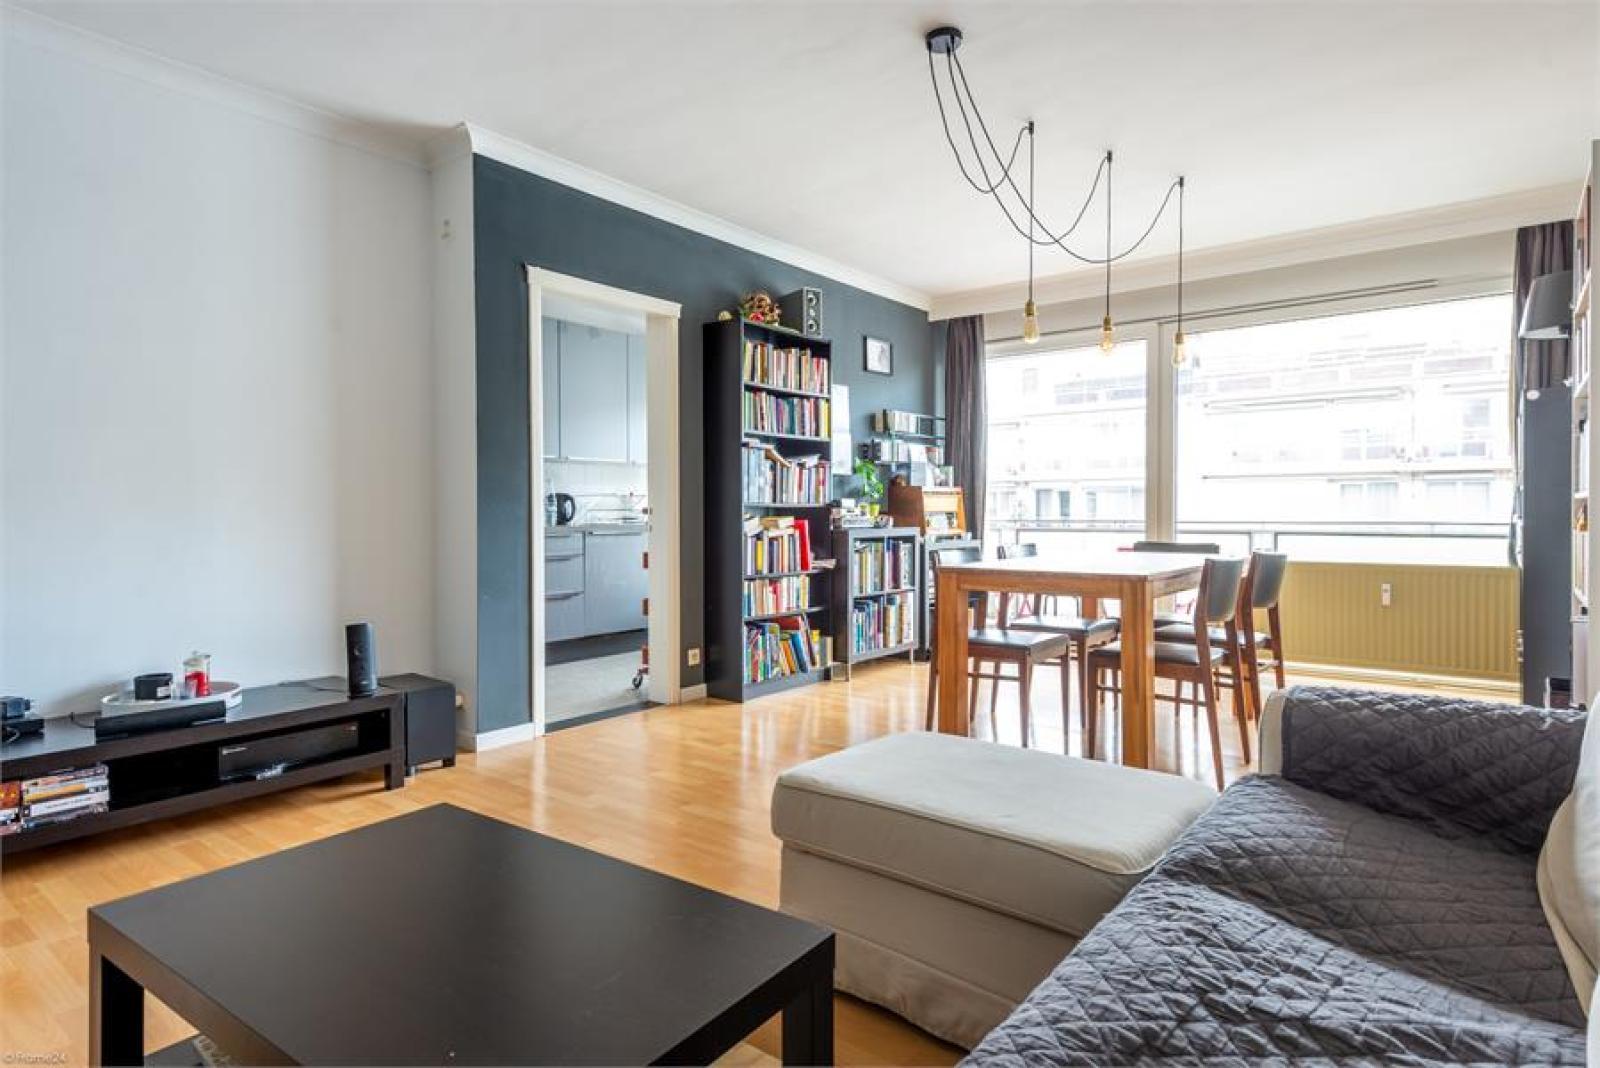 Instapklaar appartement (77 m²) met twee slaapkamers op centrale ligging te Deurne! afbeelding 3